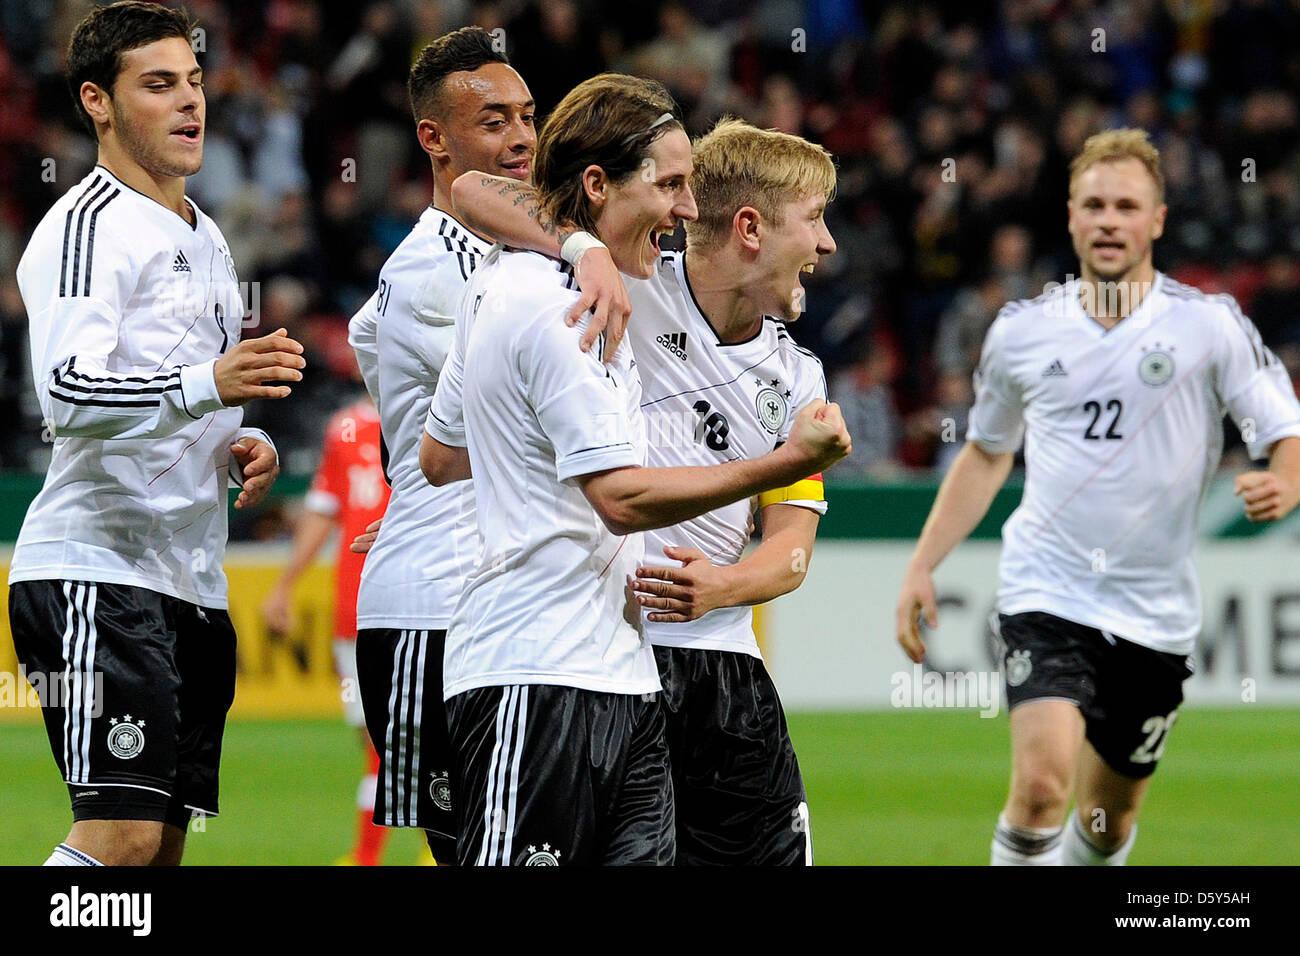 Germany's Kevin Volland (L-R), Karim Bellarabi, goal scorer Sebastian Rudy, Lewis Holtby and Maximilian Beister - Stock Image